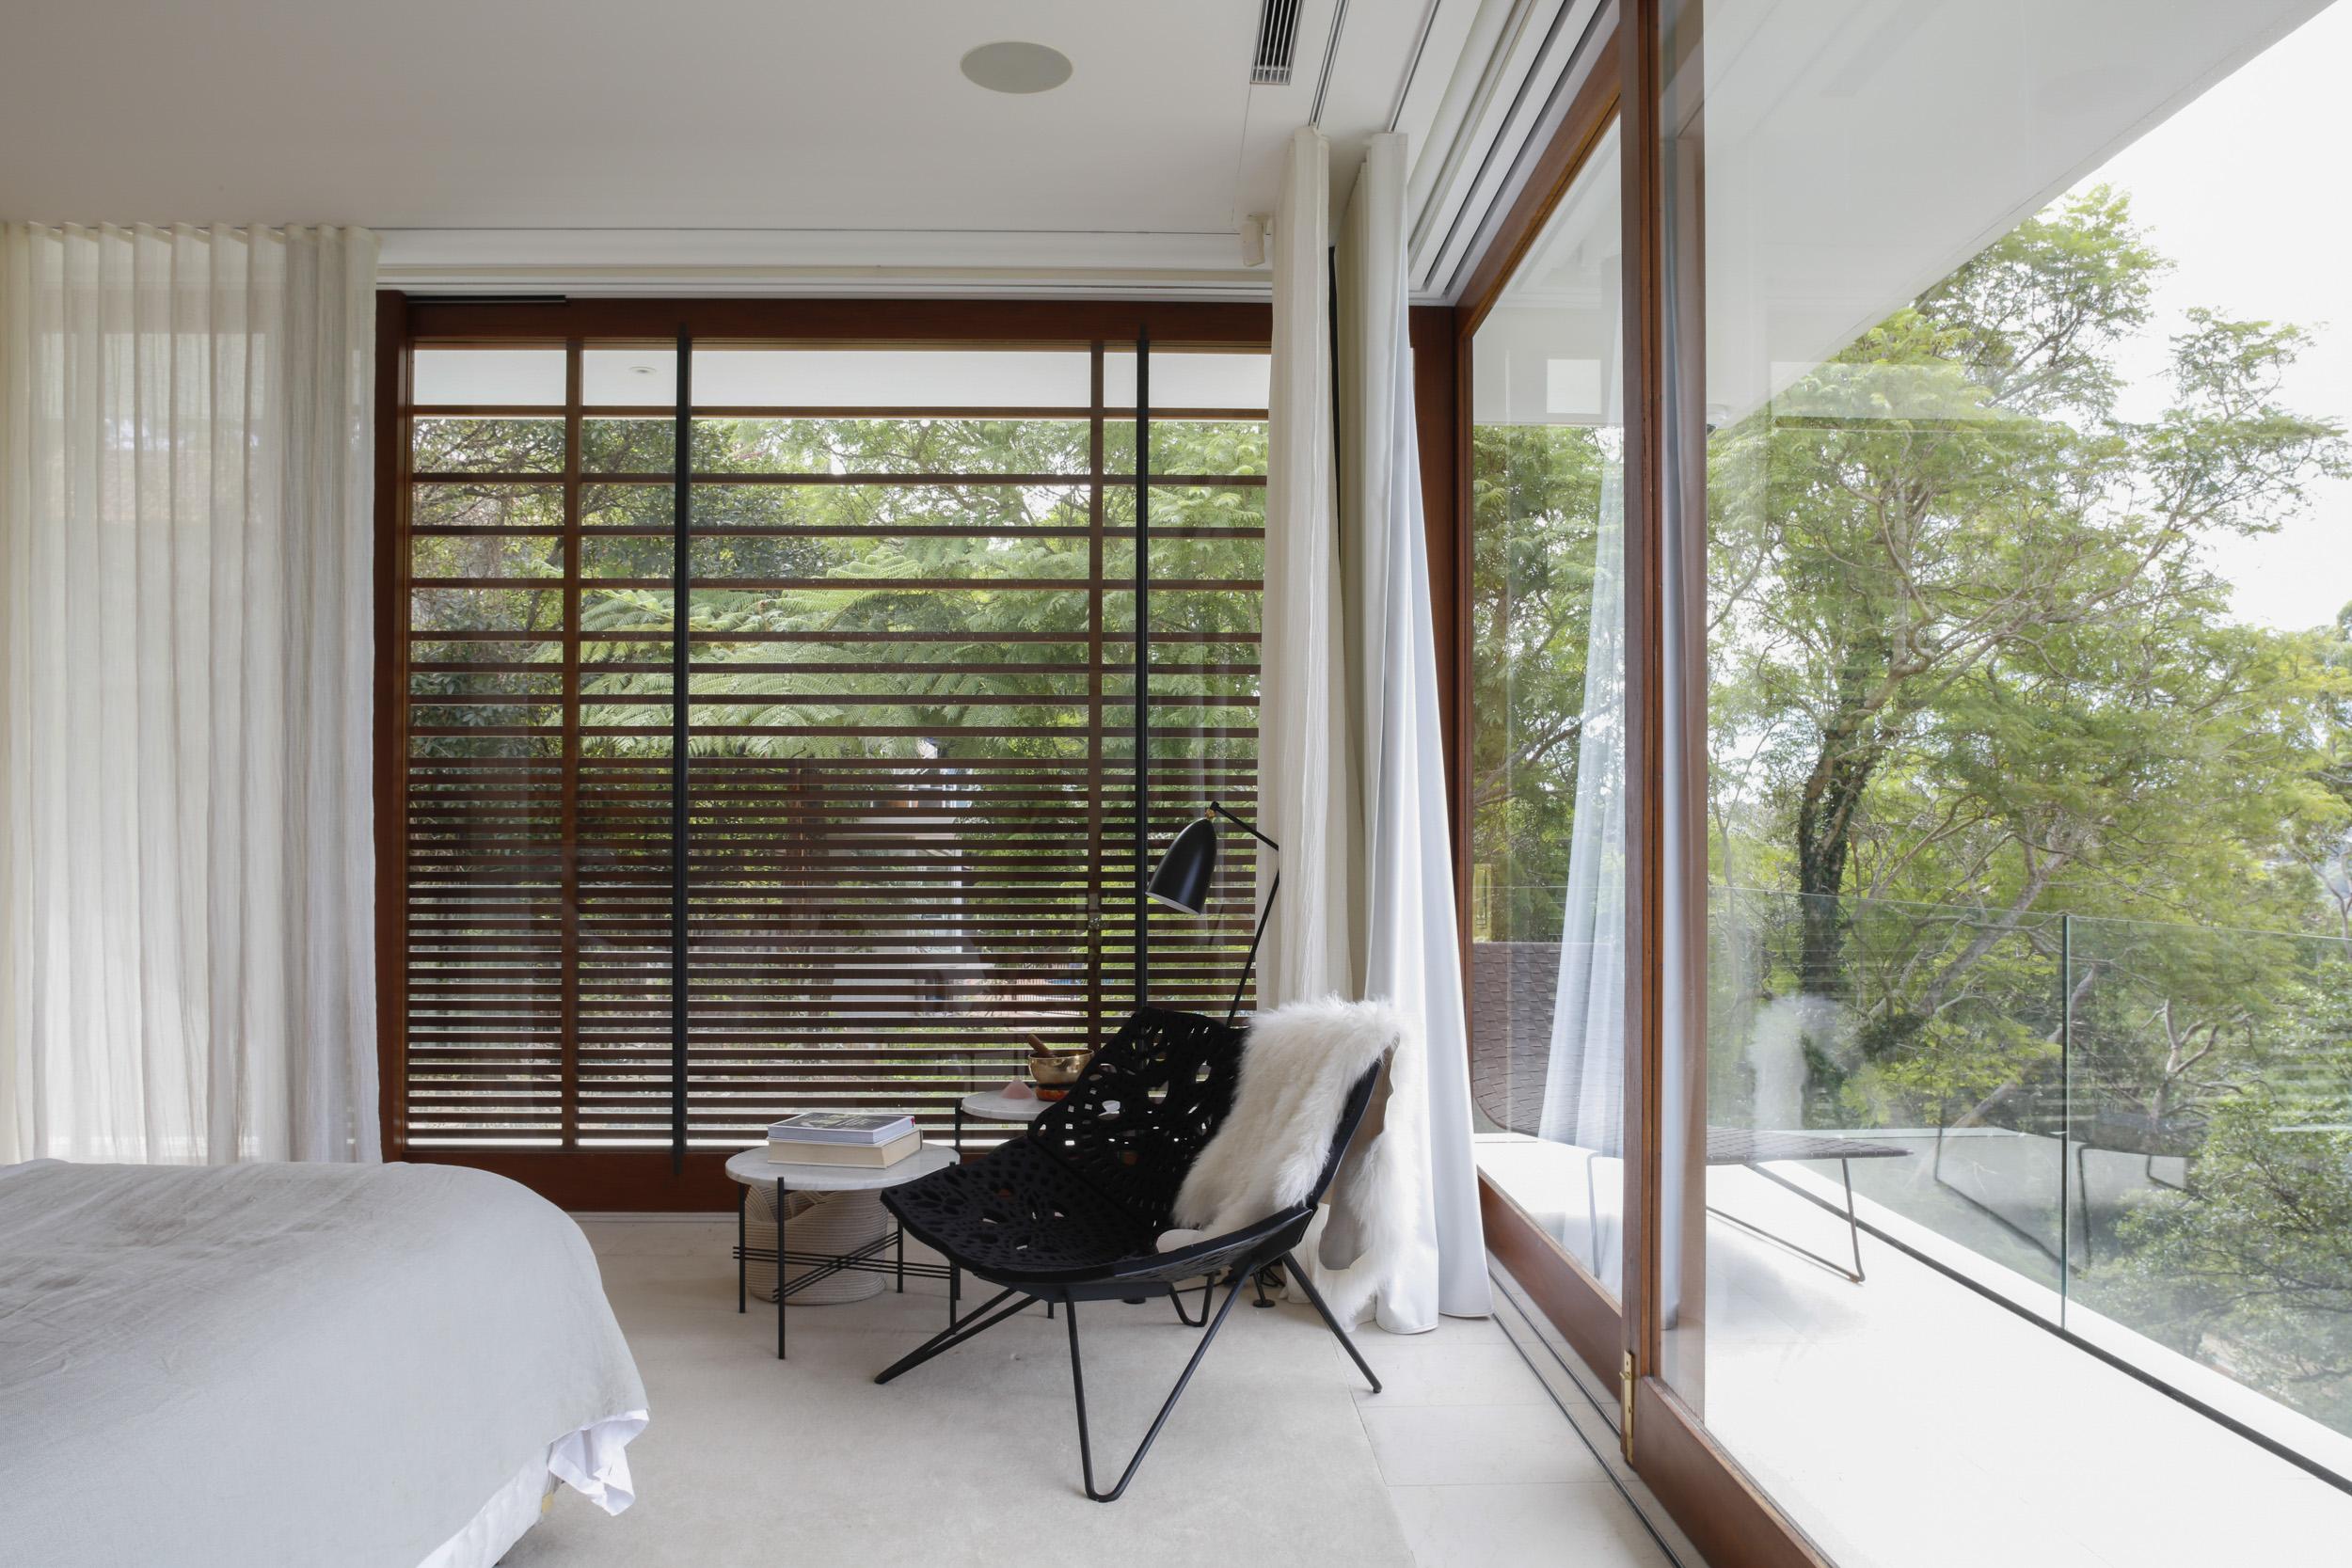 residential_architect_photographer_sydney_32.jpg